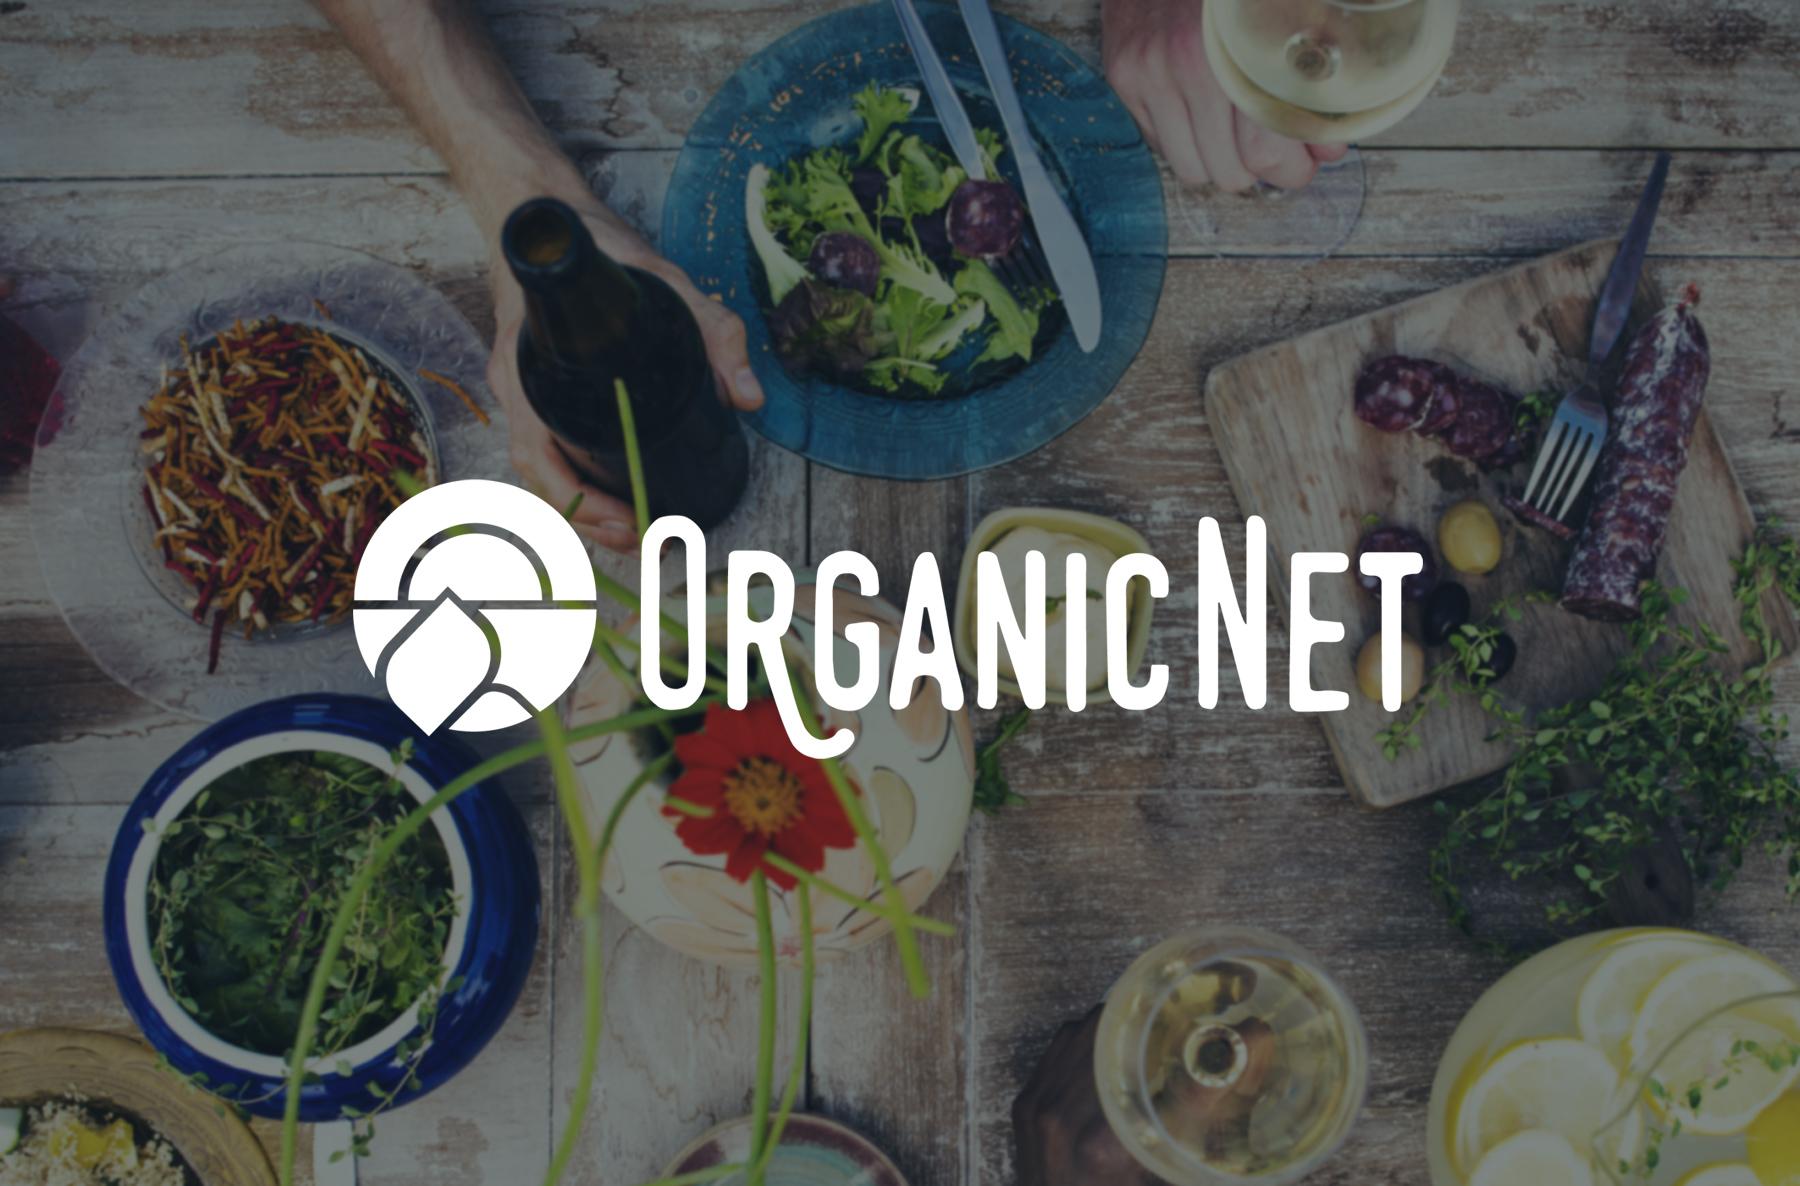 organicnet platform